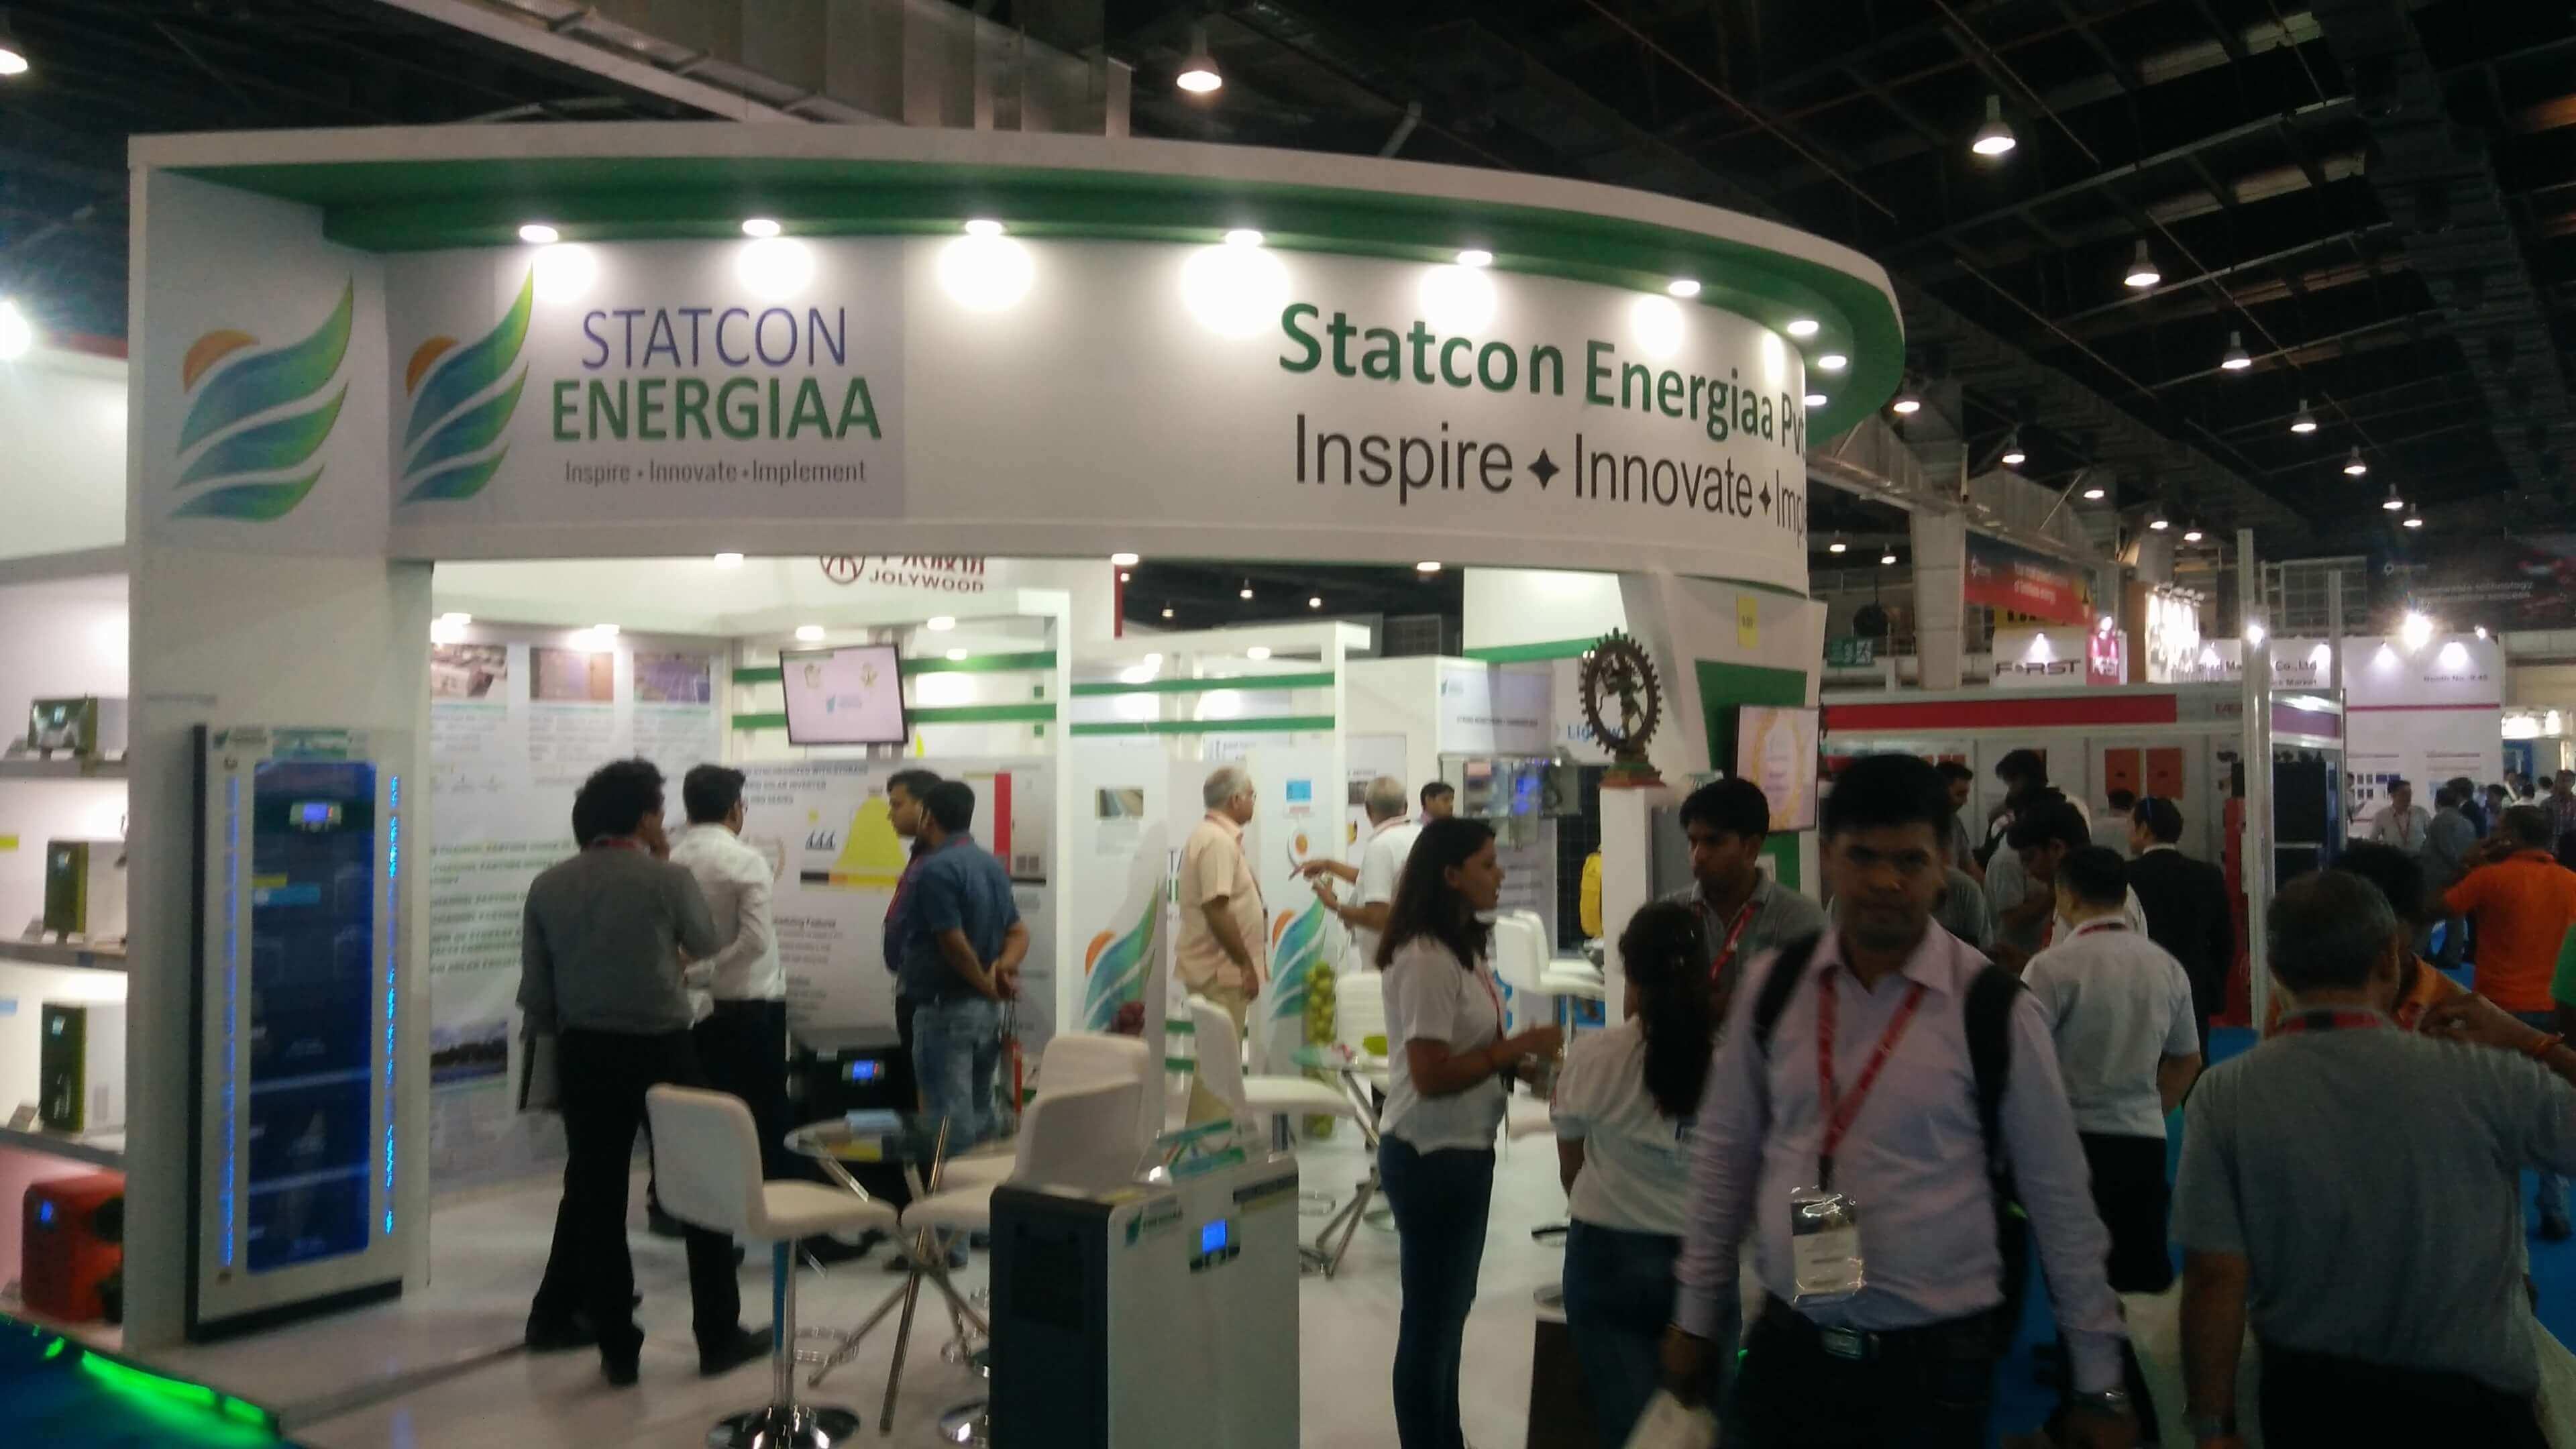 Energiaa 2017 REI Stall